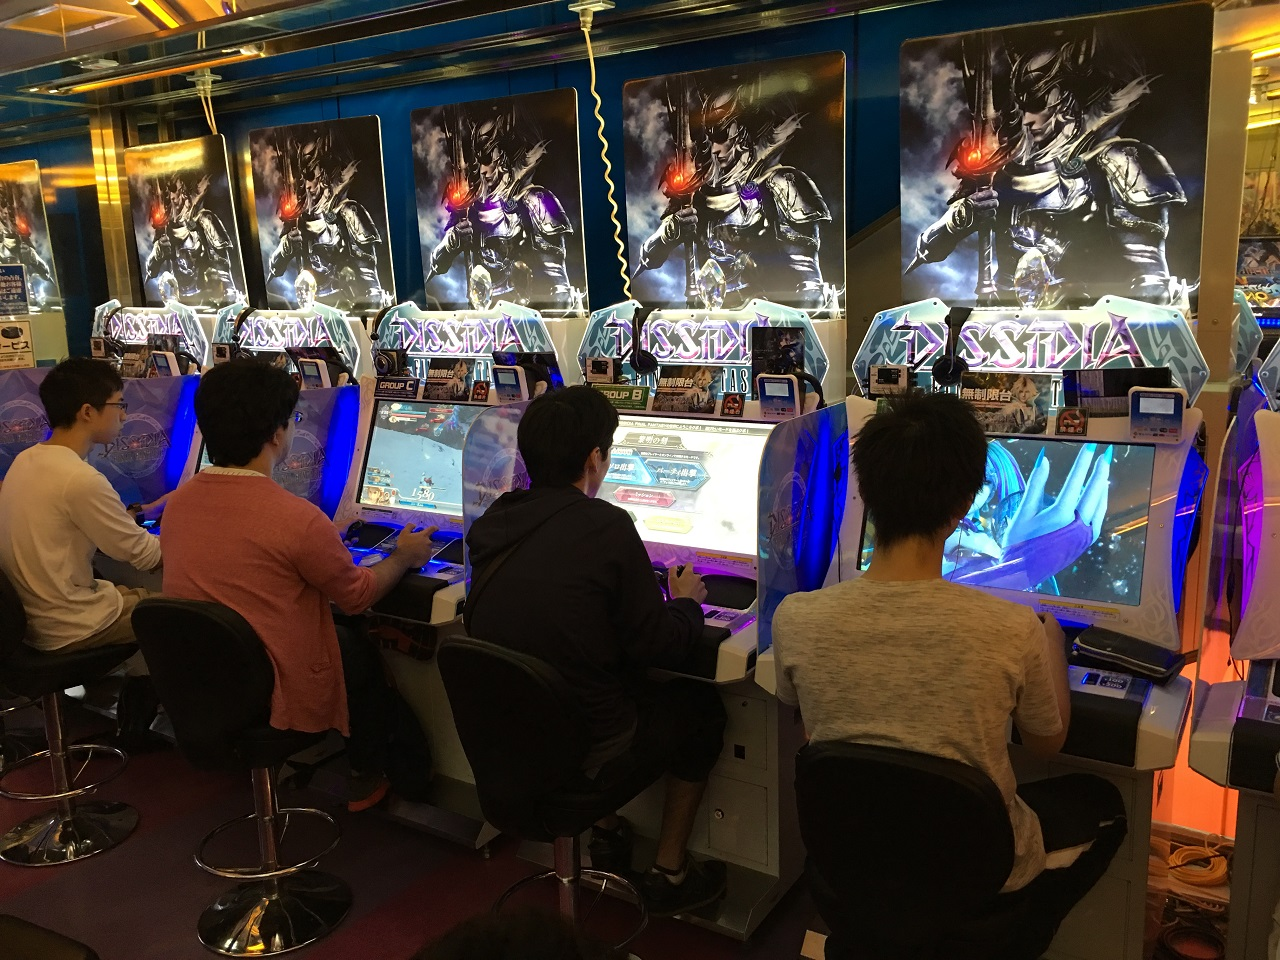 160912_28827_tgs_2016_arcade_1.JPG